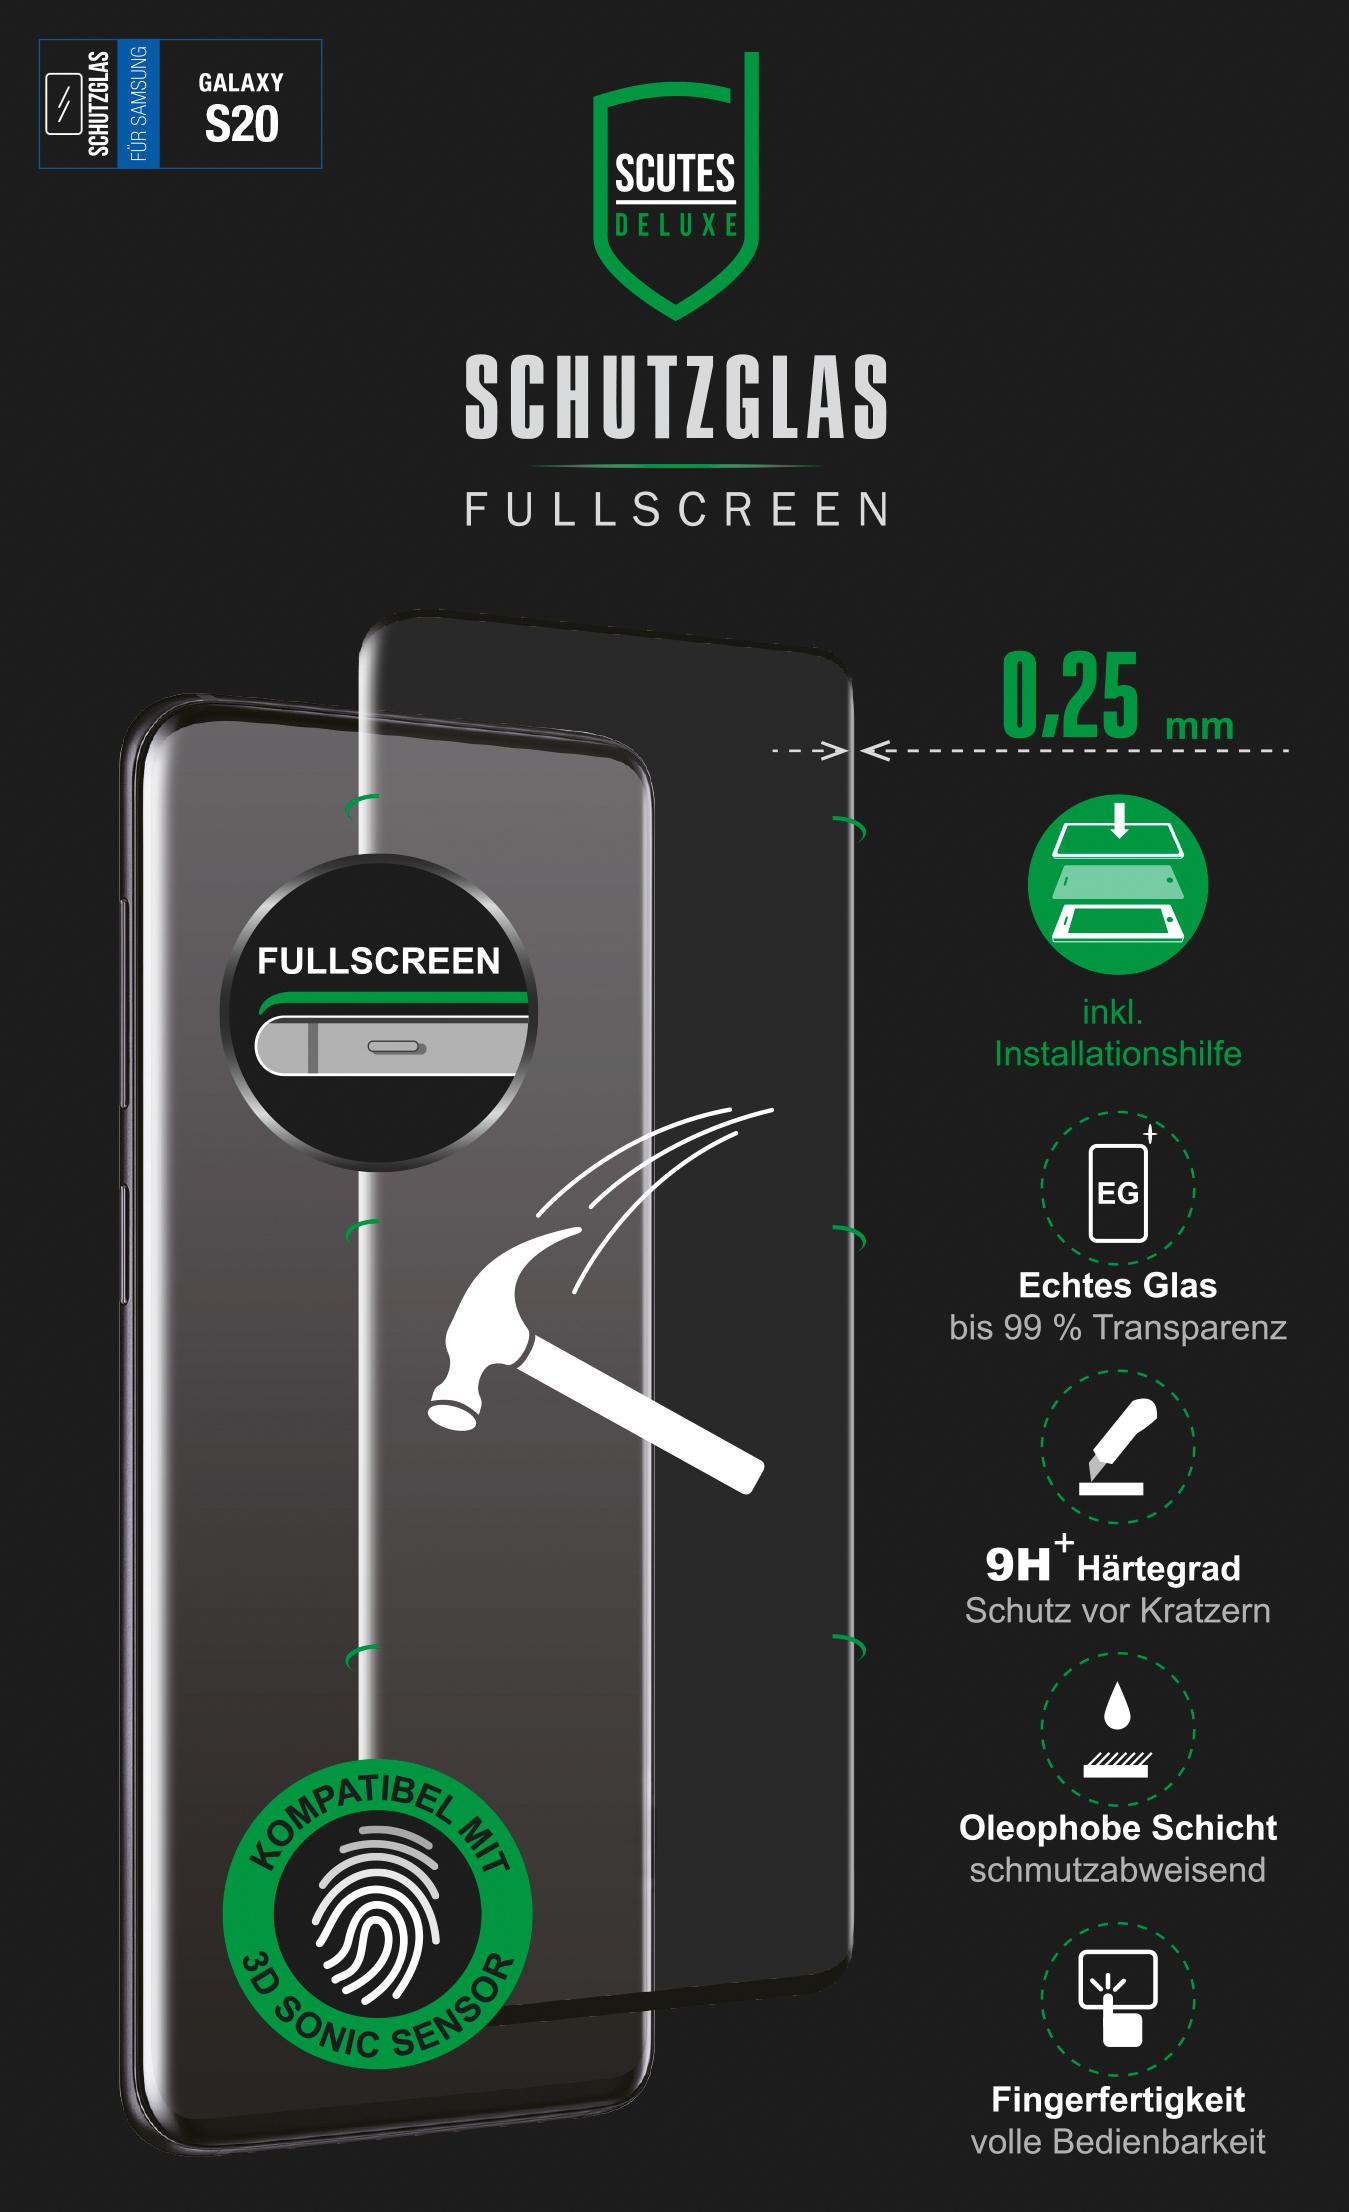 Fullscreen Schutzglas (Samsung Galaxy S20)